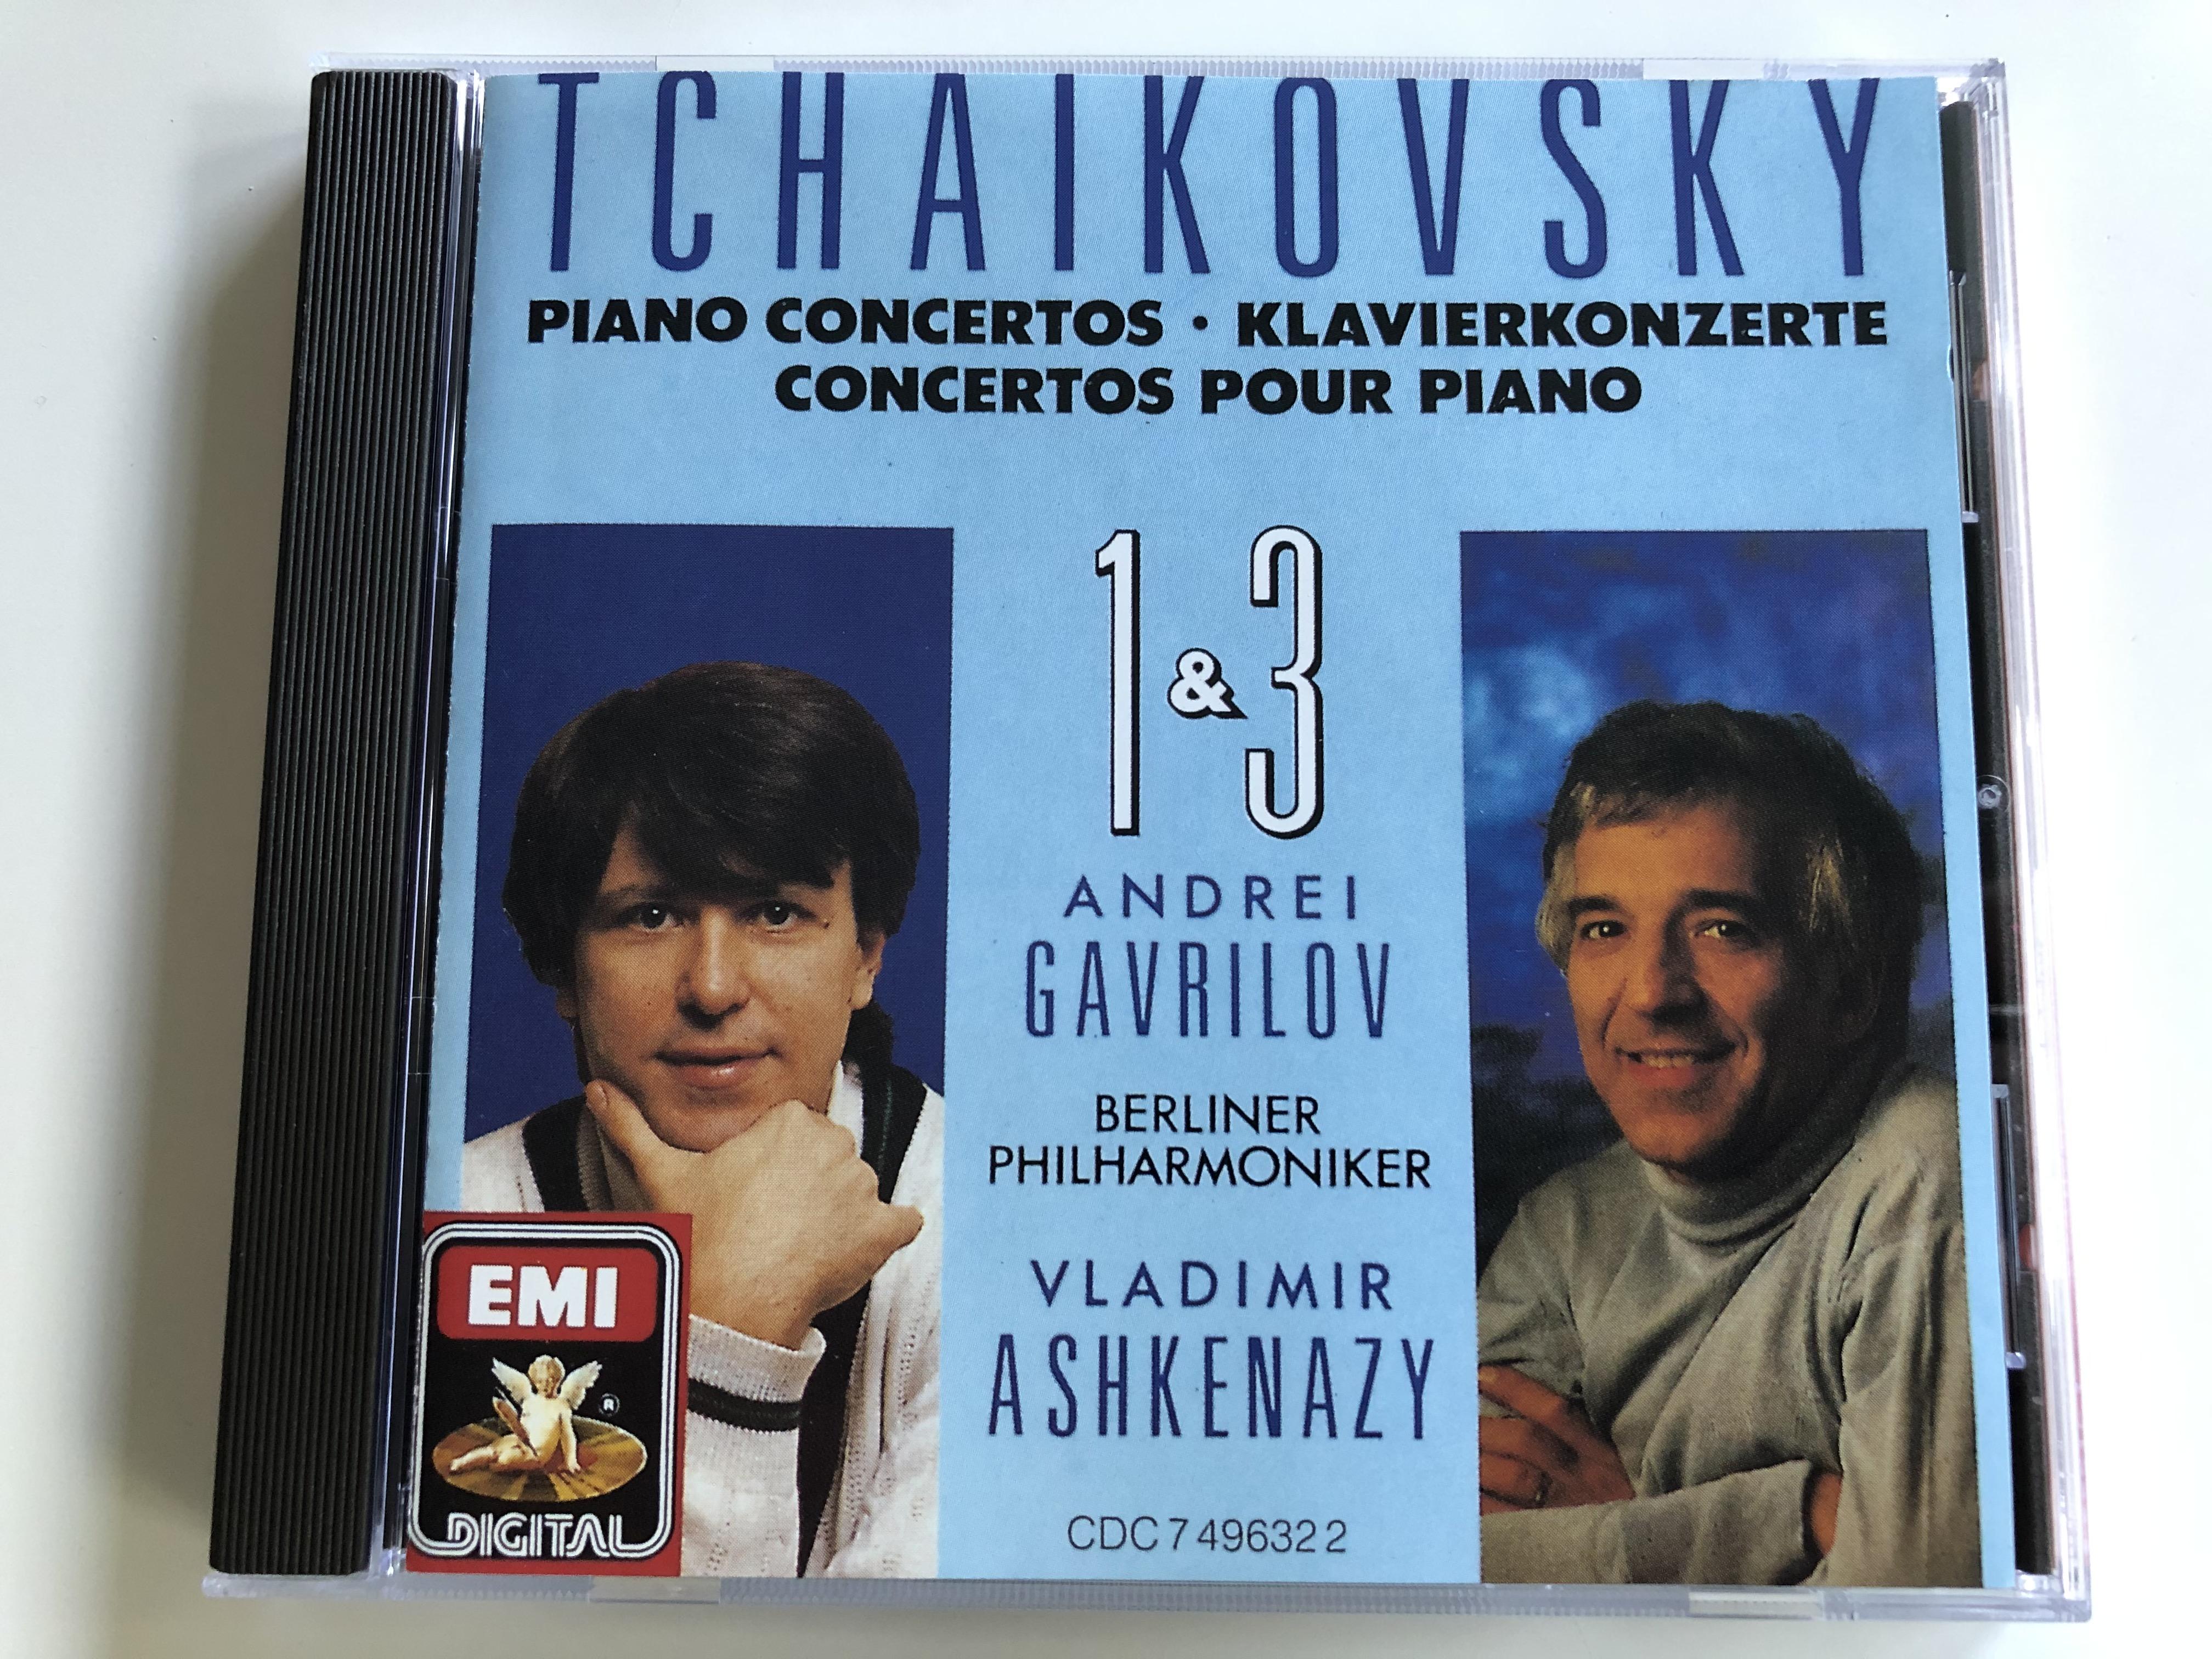 tchaikovsky-piano-concertos-klavierkonzerte-concertos-pour-piano-1-3-andrei-gavrilov-berliner-philharmoniker-vladimir-ashkenazy-emi-audio-cd-1989-stereo-cdc-7-49632-2-1-.jpg